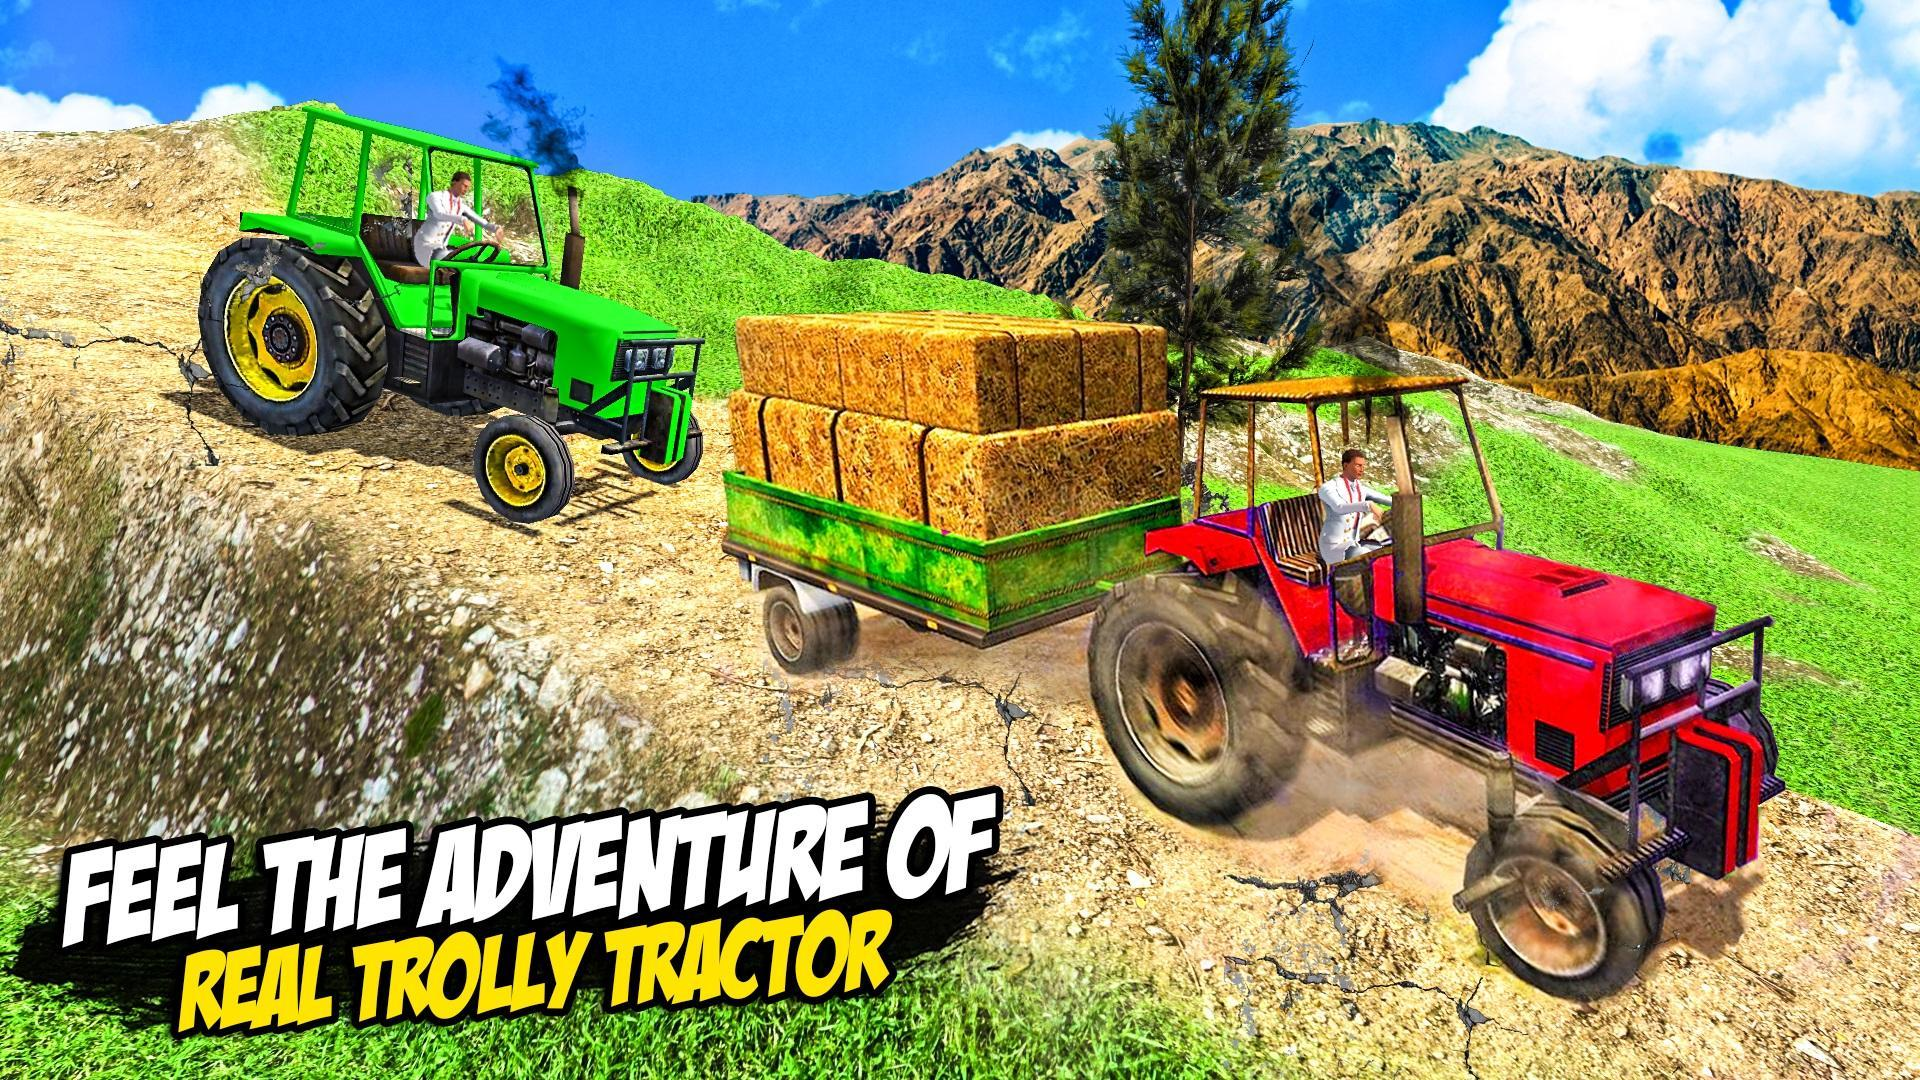 Heavy Tractor Trolley: Tractor Cargo Simulator🚜🚜 3.1 Screenshot 5